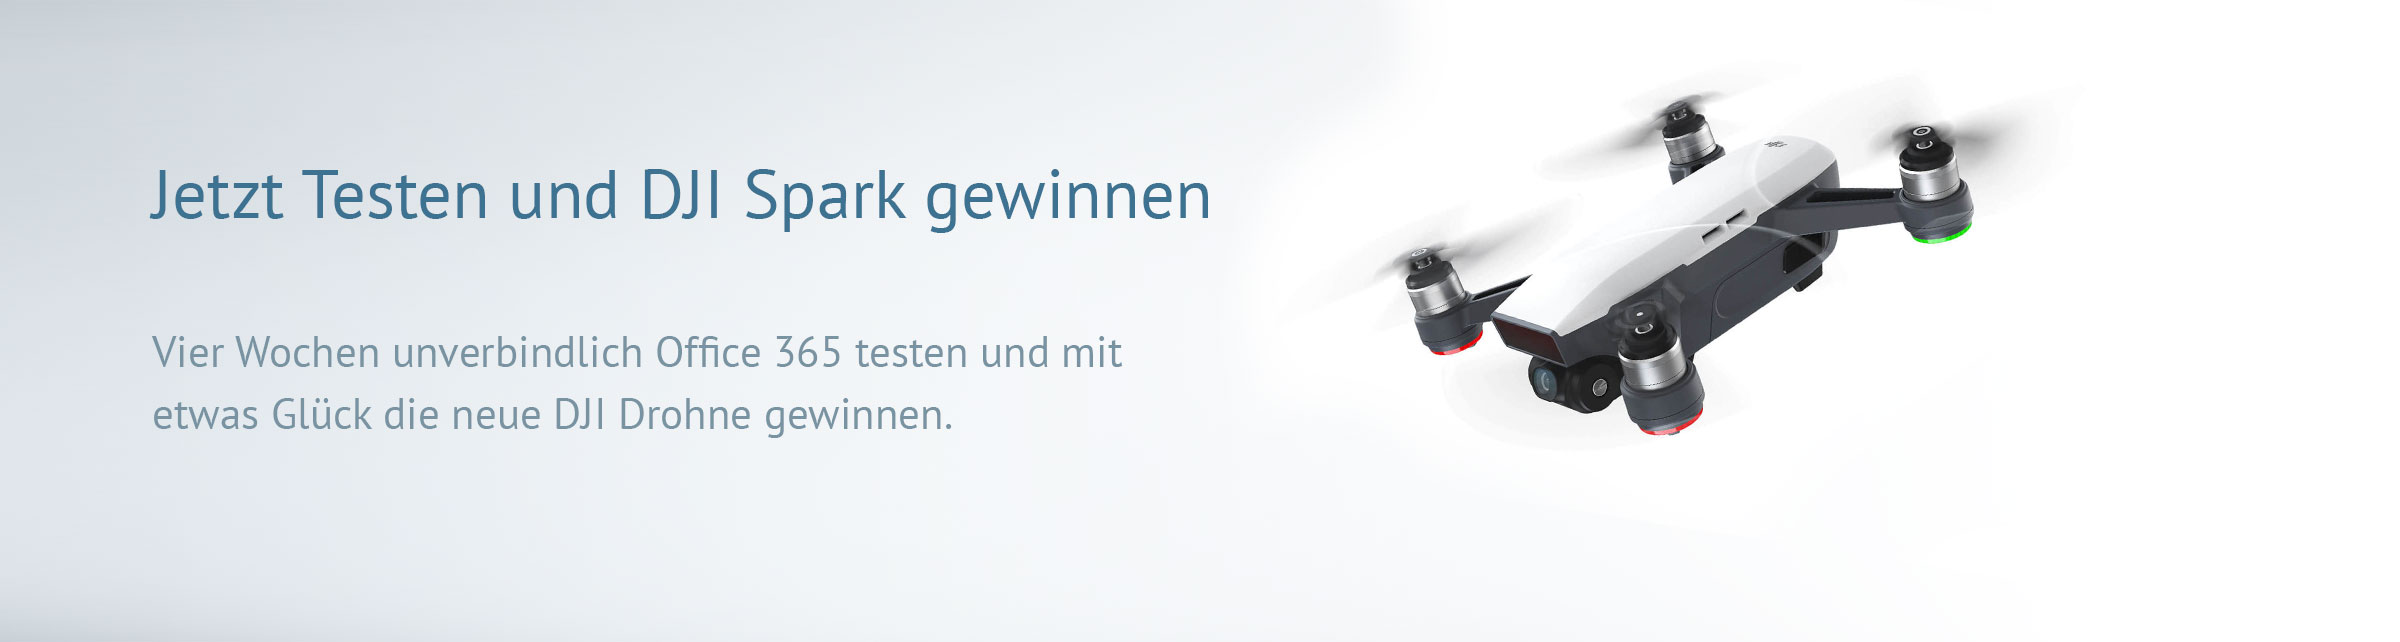 Veroo Consulting GmbH